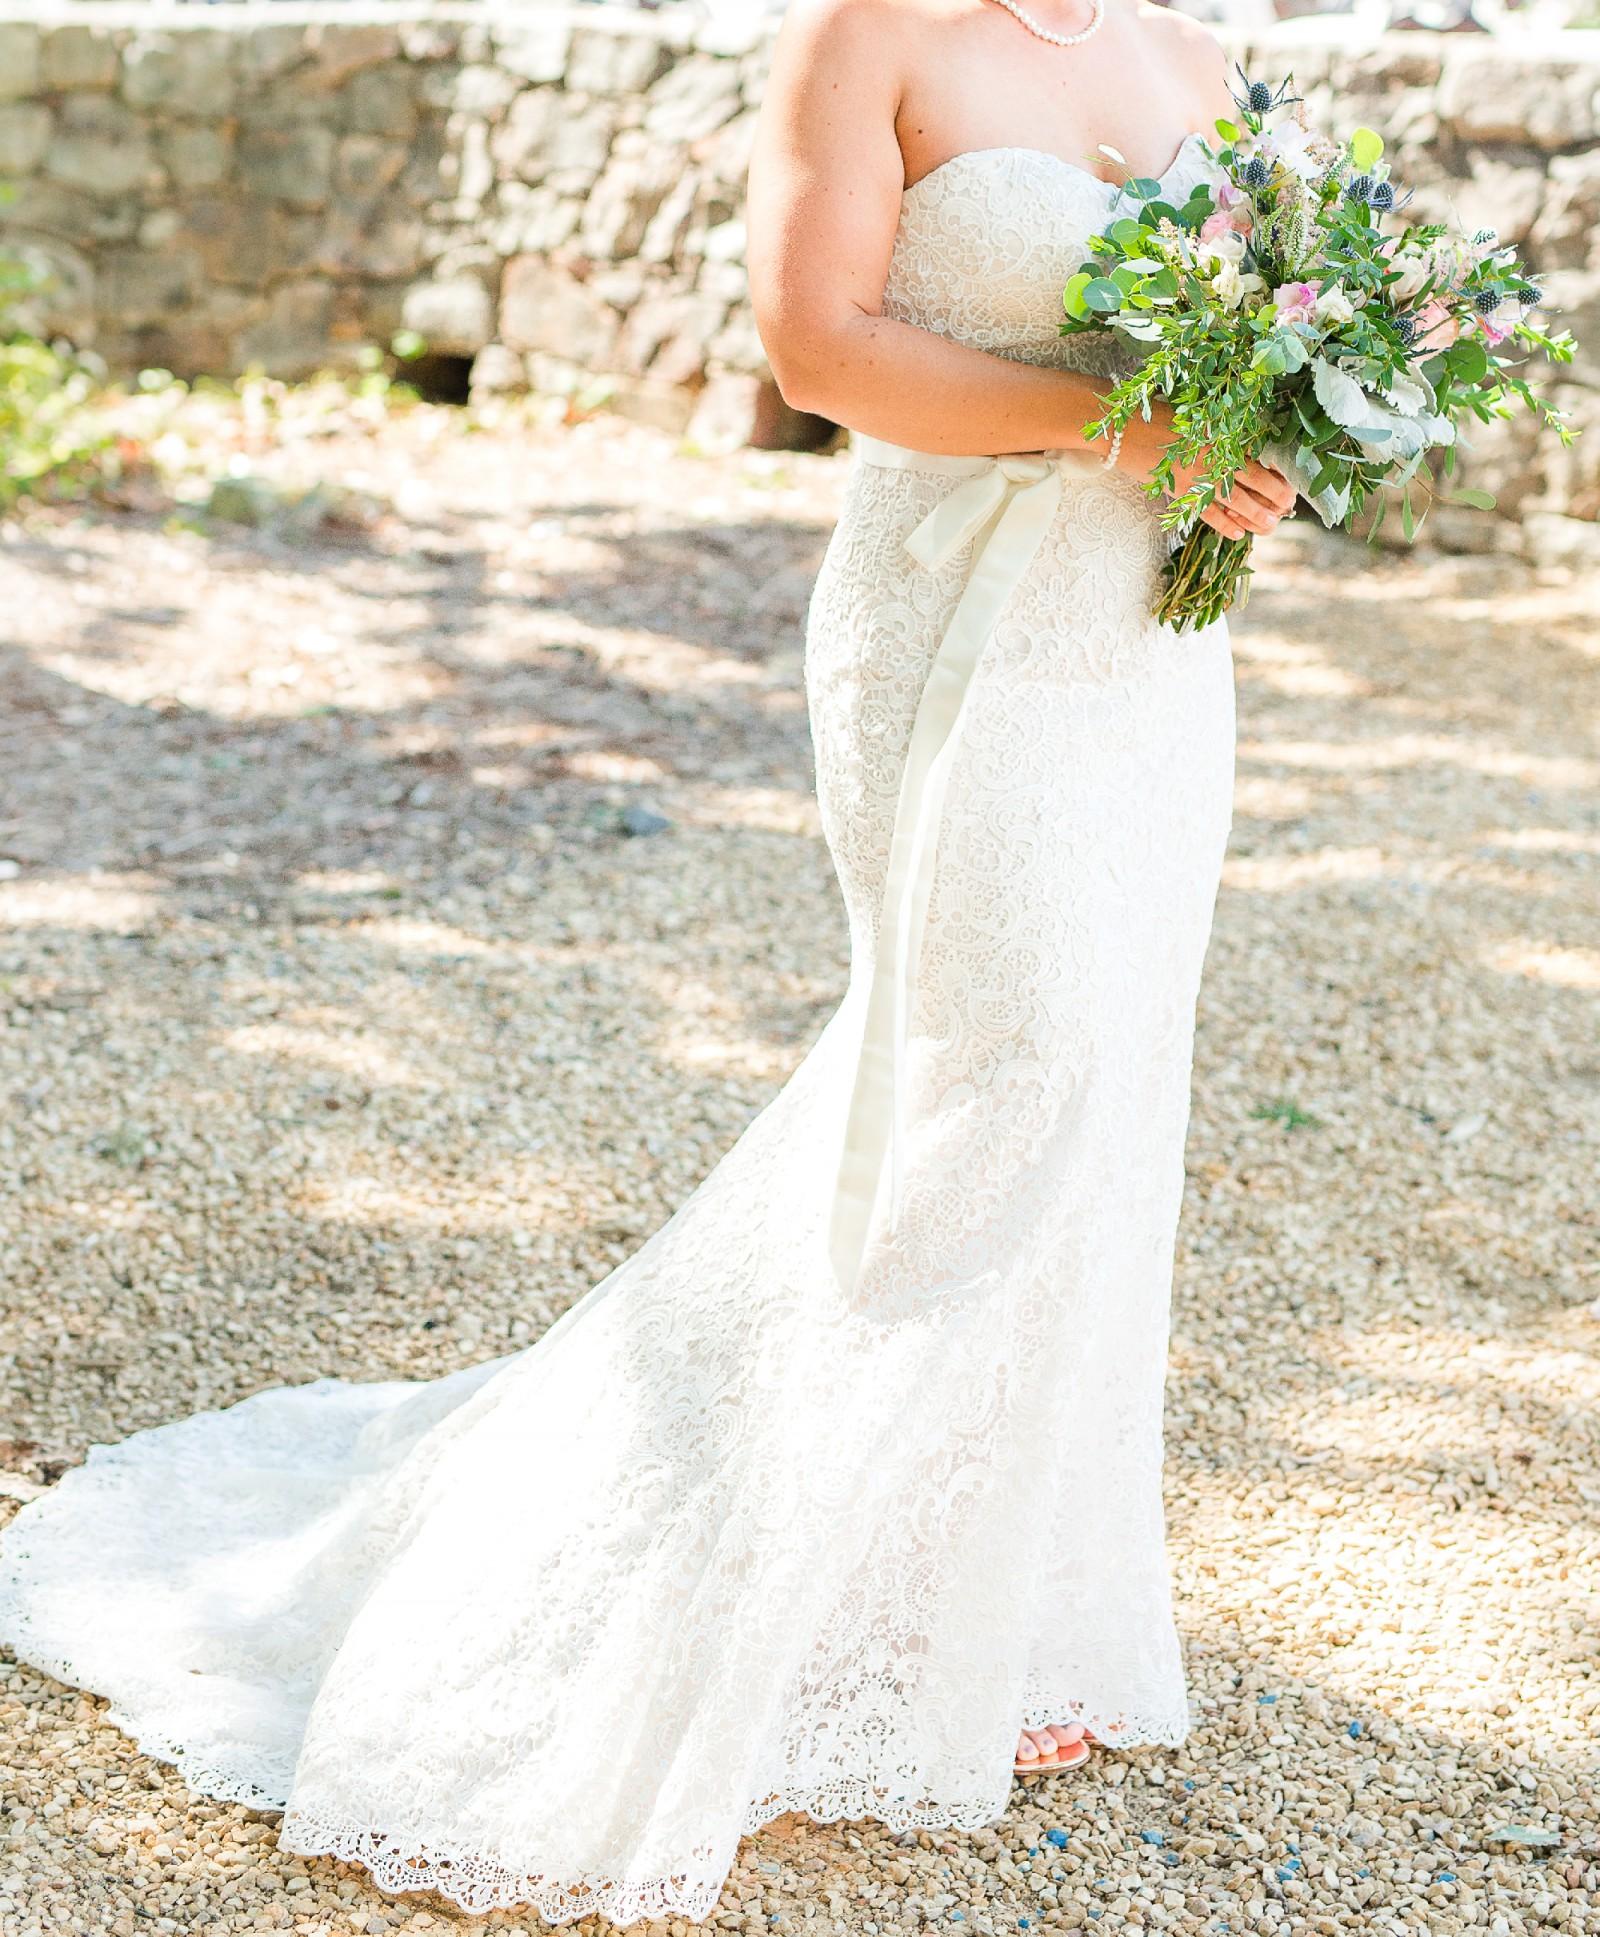 Maggie Sottero Lottie Preowned Wedding Dress On Sale 53